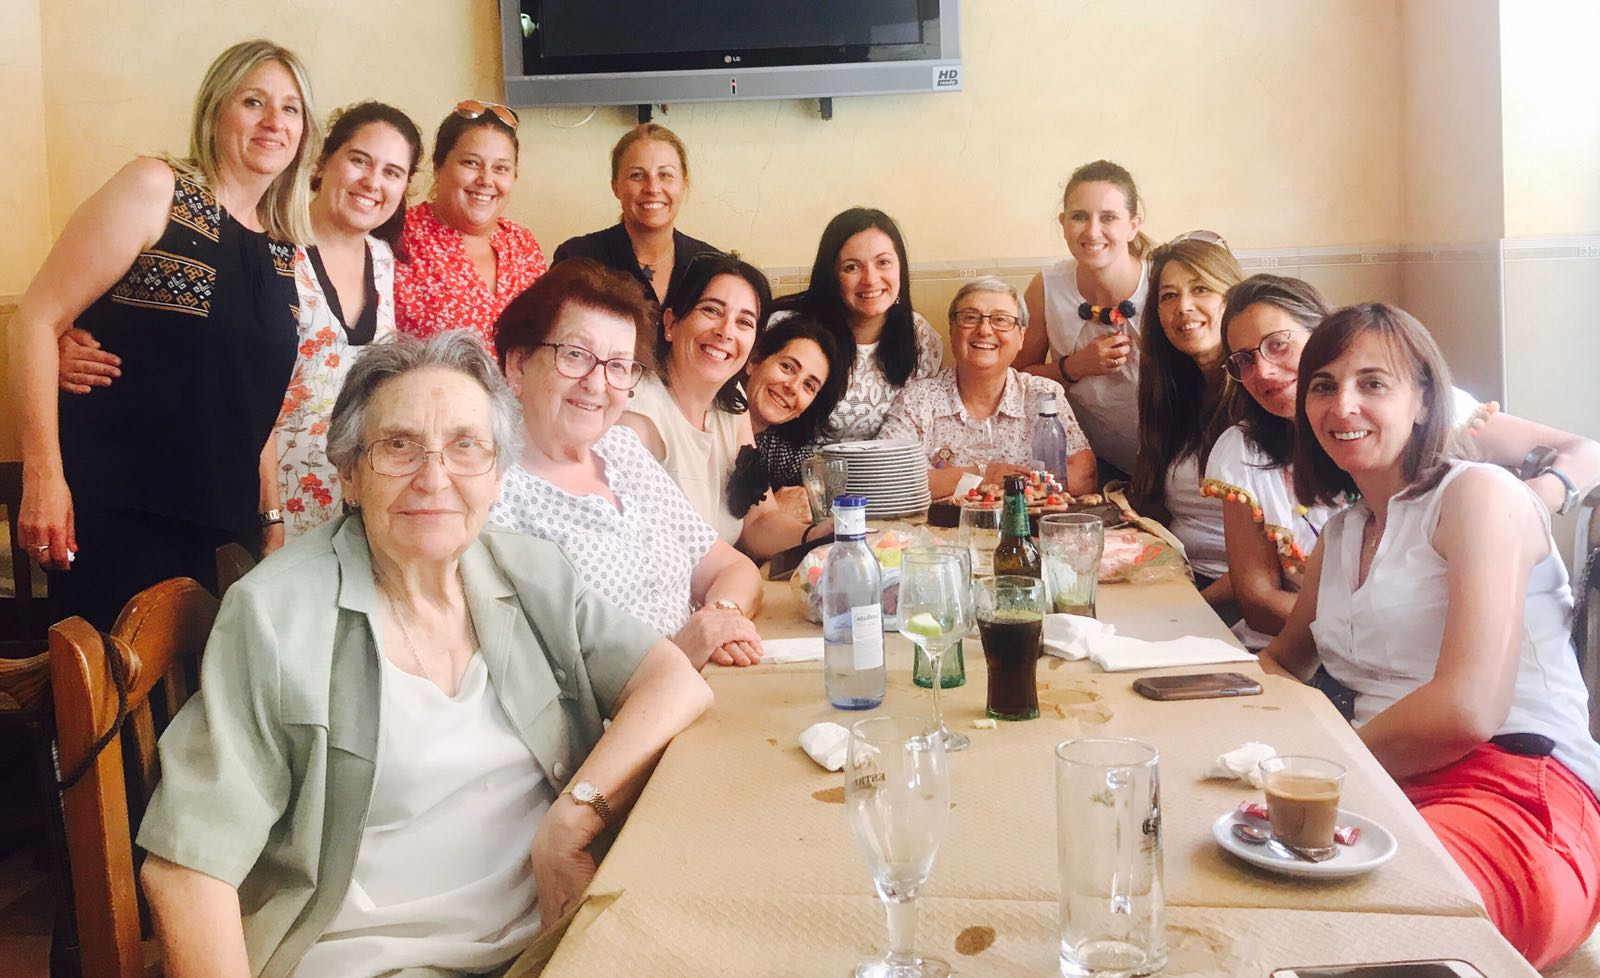 Desde VIDES, gracias al grupo The Mamas & The Papas de Alicante